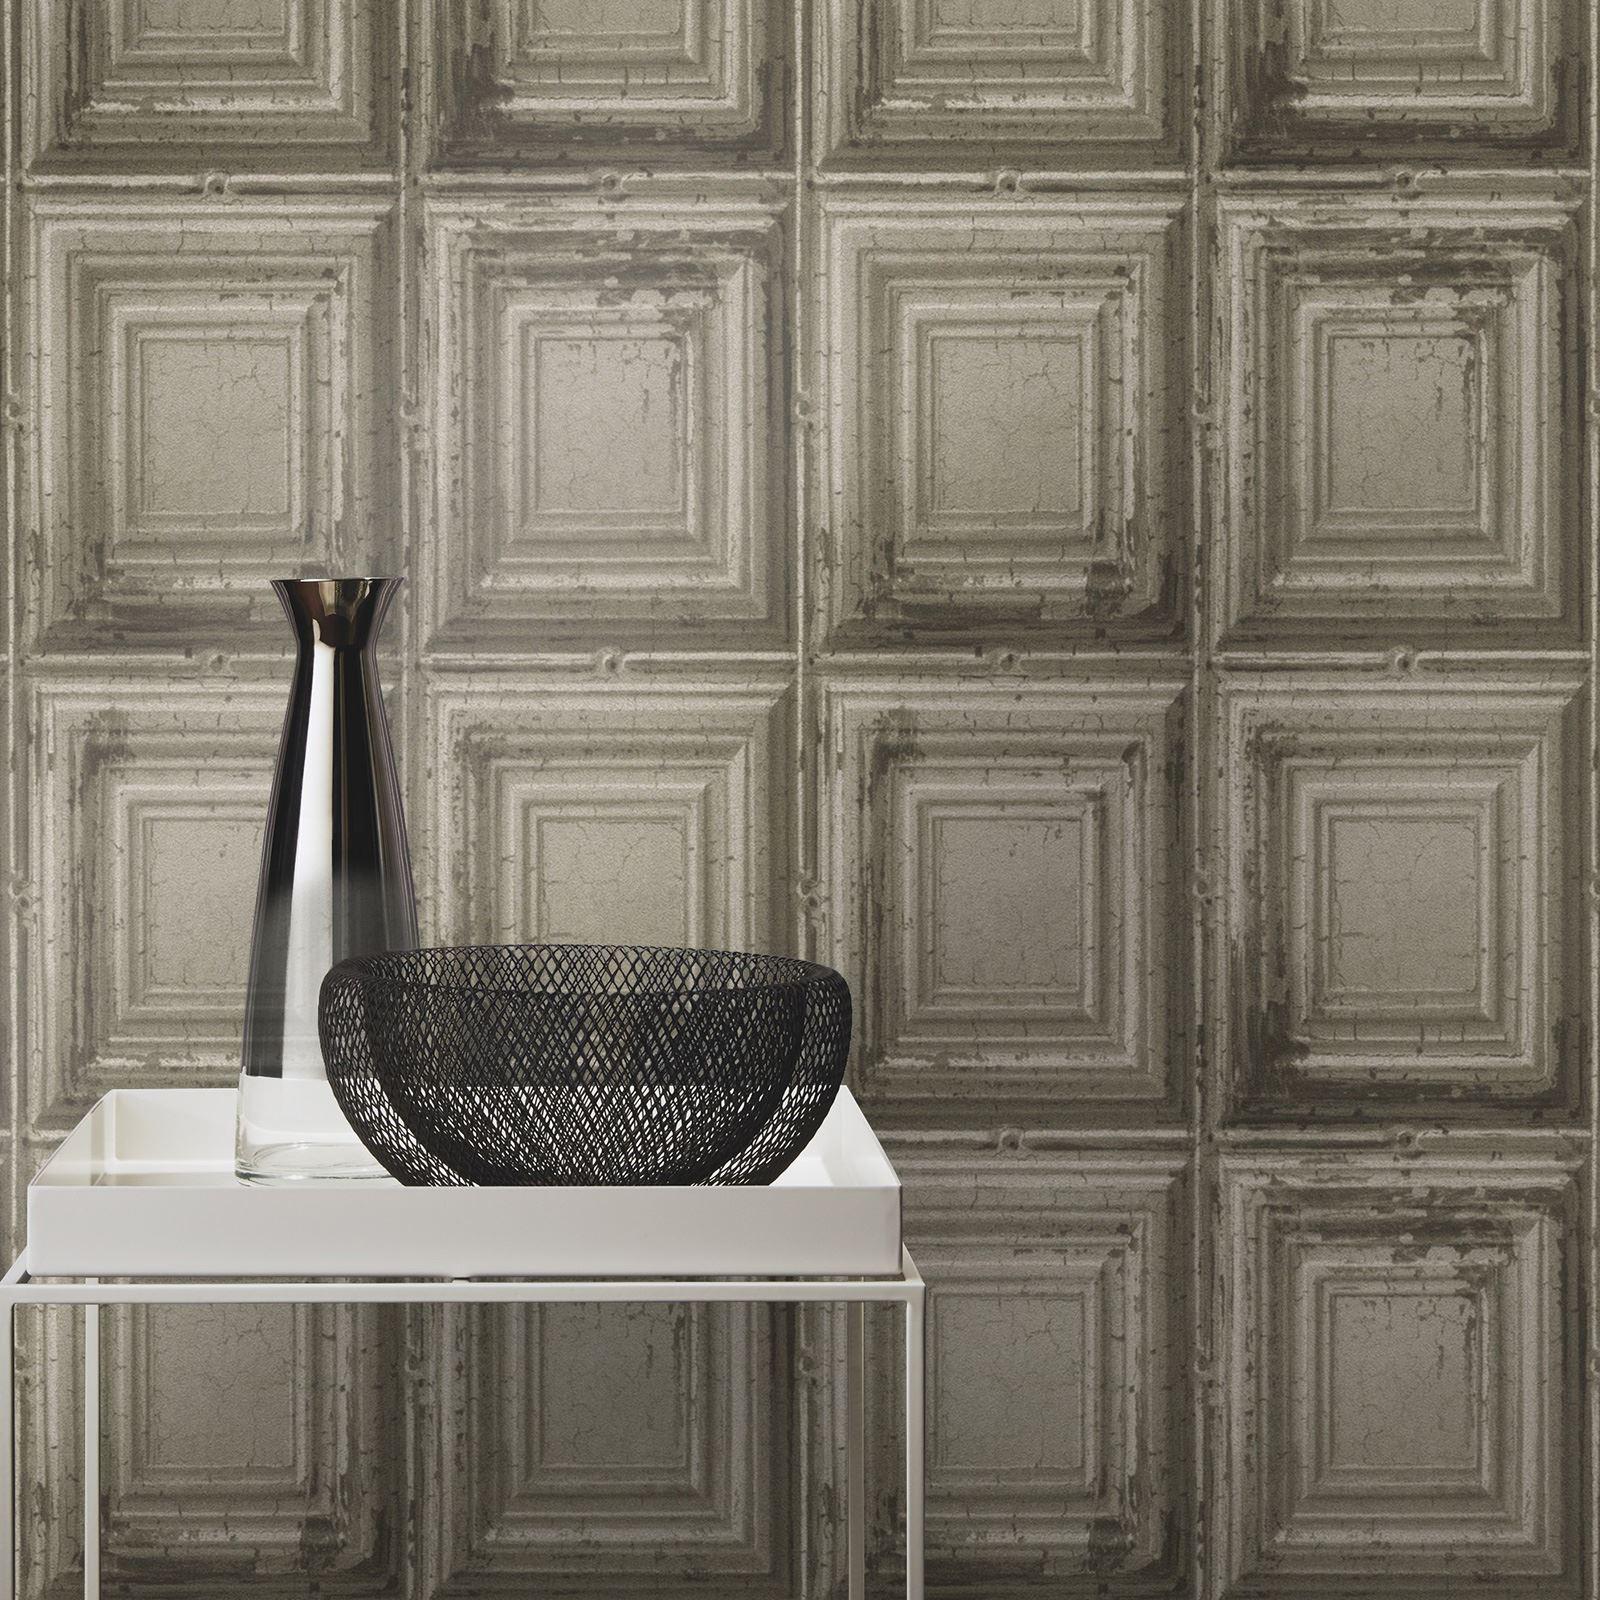 Distressed Wood Panel Wallpaper Rolls Rasch 932607